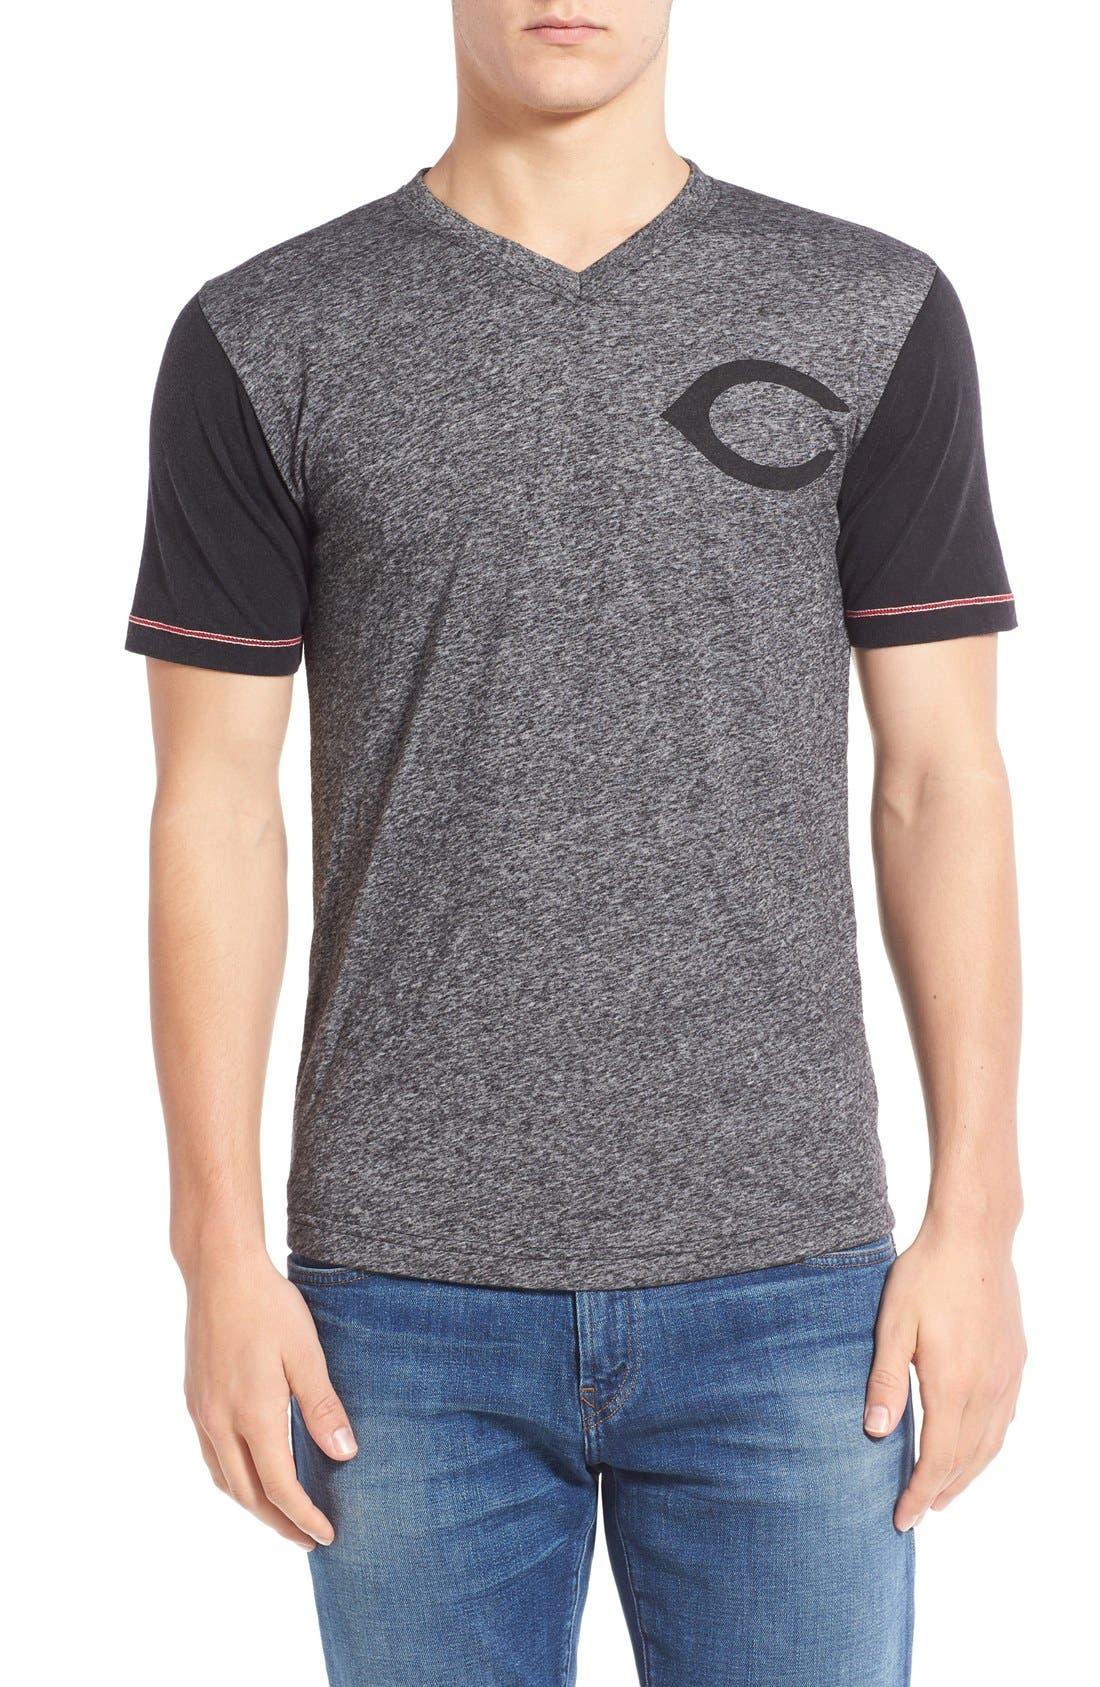 Main Image - Red Jacket 'Cincinnati Reds - Onyx' Trim Fit V-Neck T-Shirt